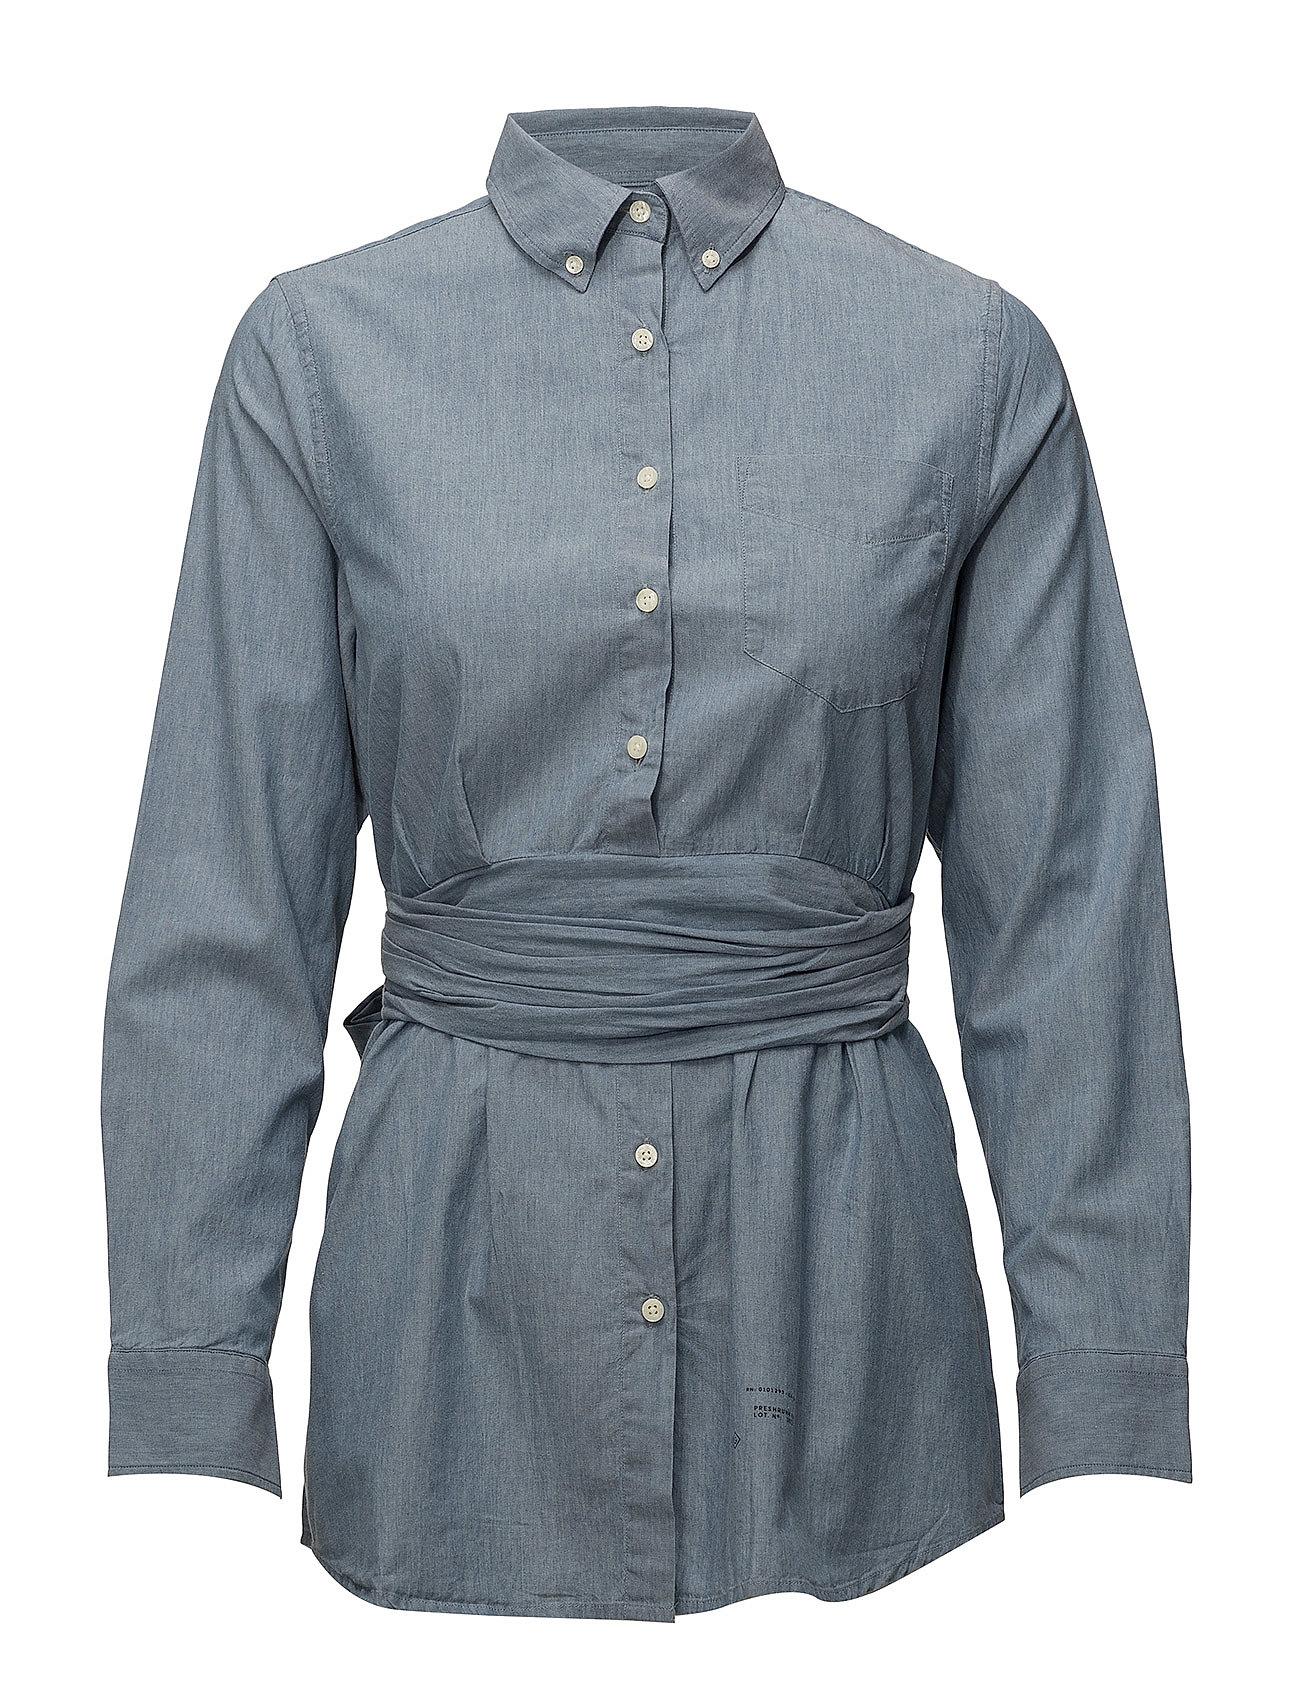 l €Gant Shirt e Indigo97 49 Chambray Bdlt R1Ind Smil QBeWCordx